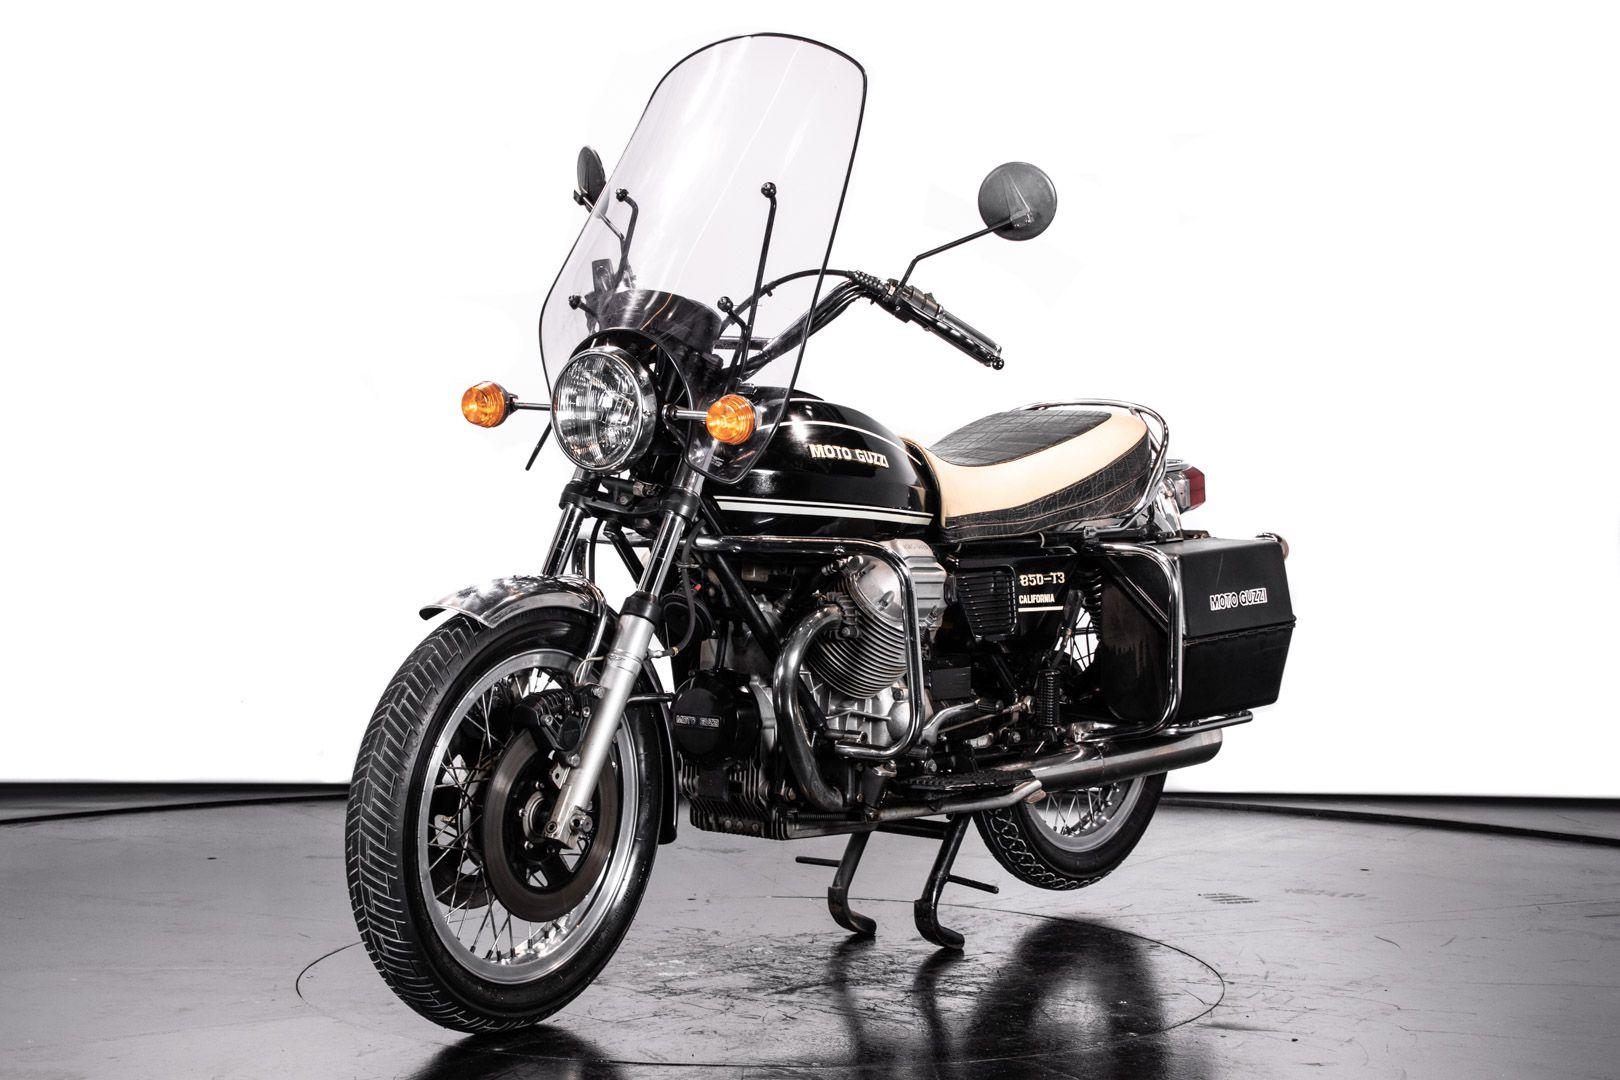 1981 Moto Guzzi 850 T3 California 83248